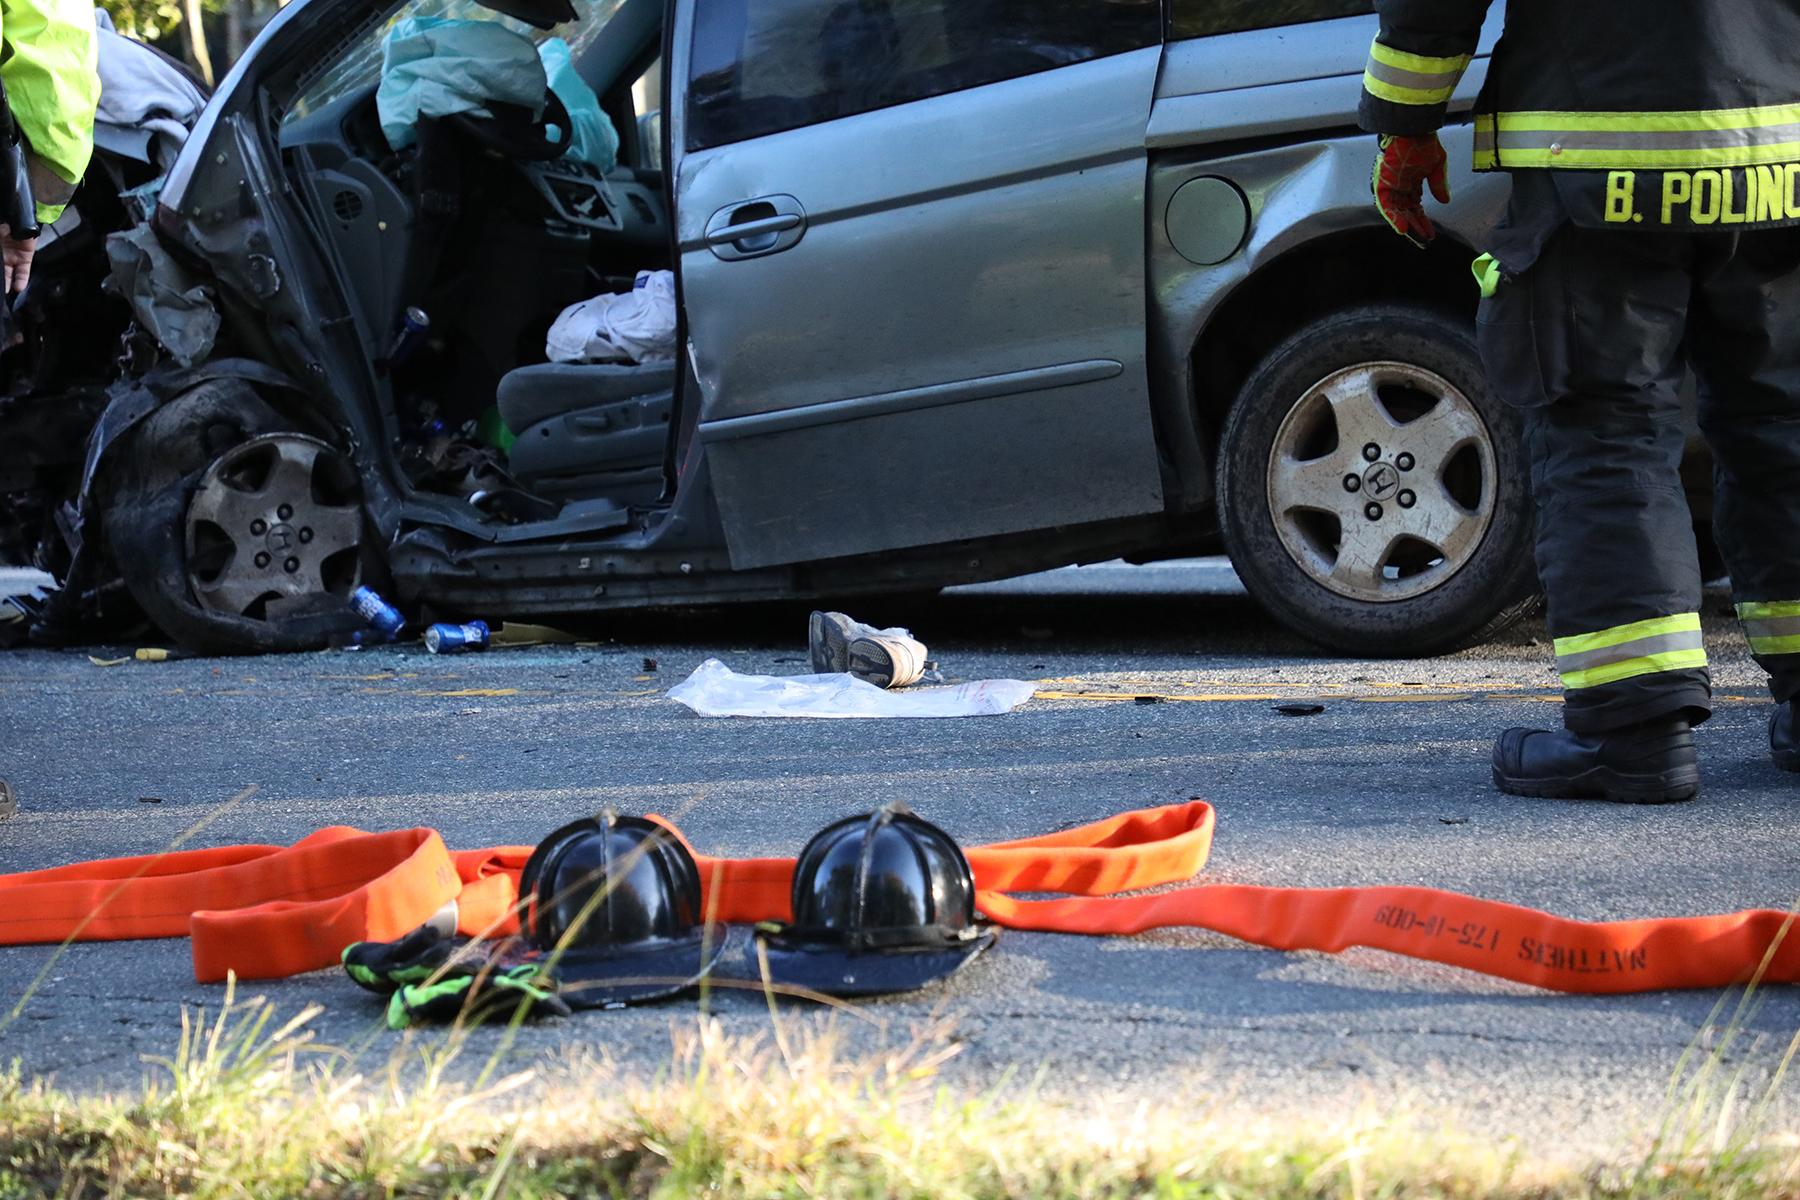 Vehicle in the Wednesday morning crash on John Street.